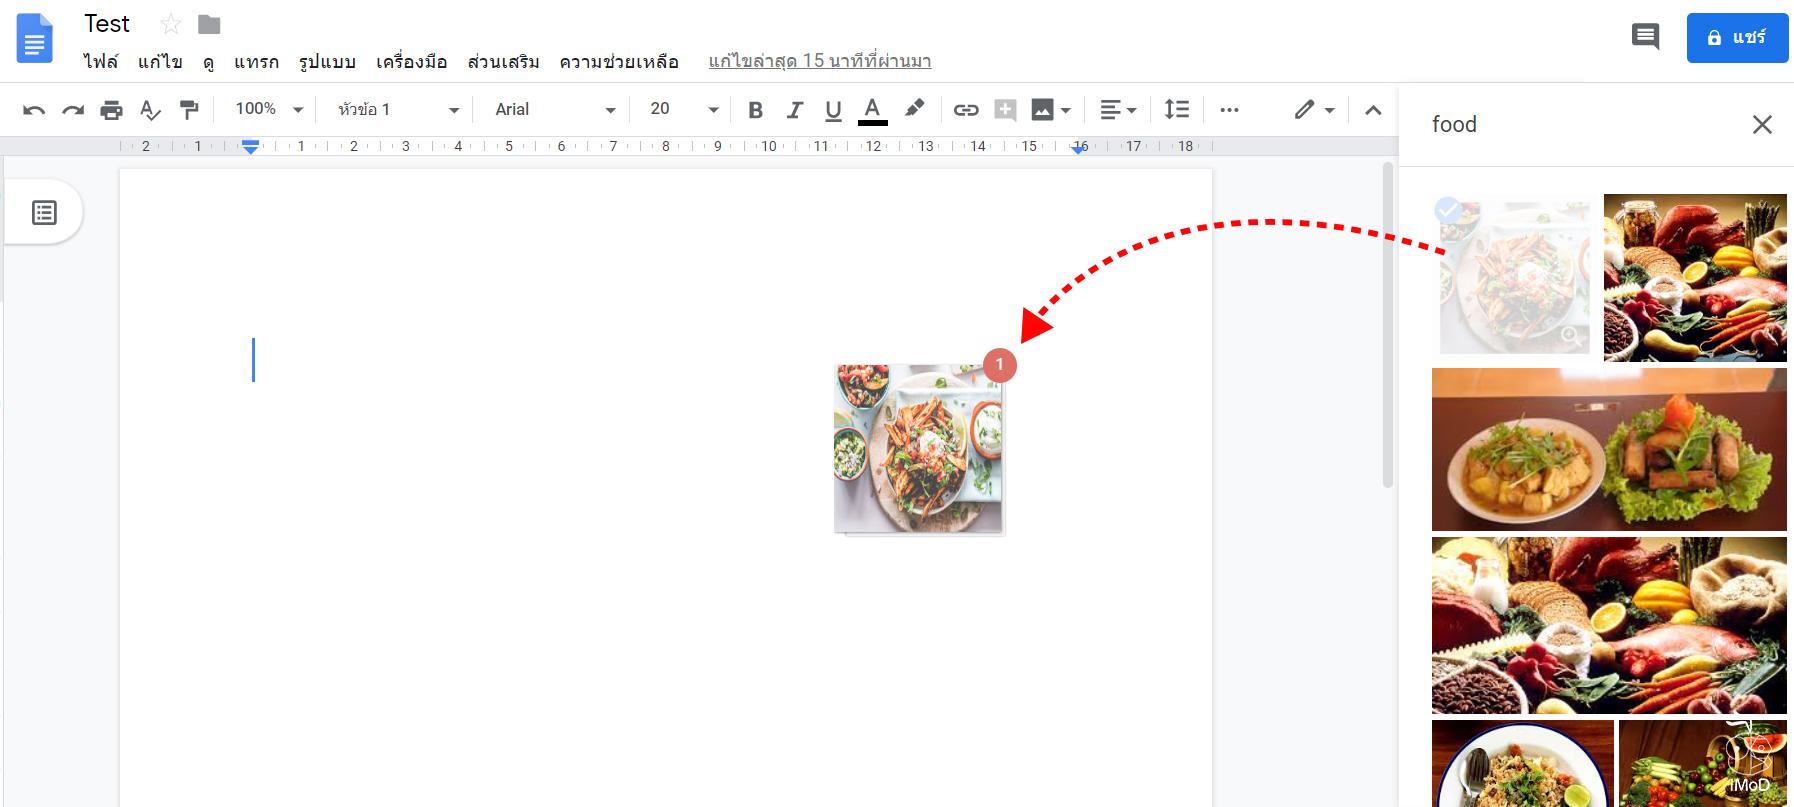 Tips Insert Images For Google Docs 02